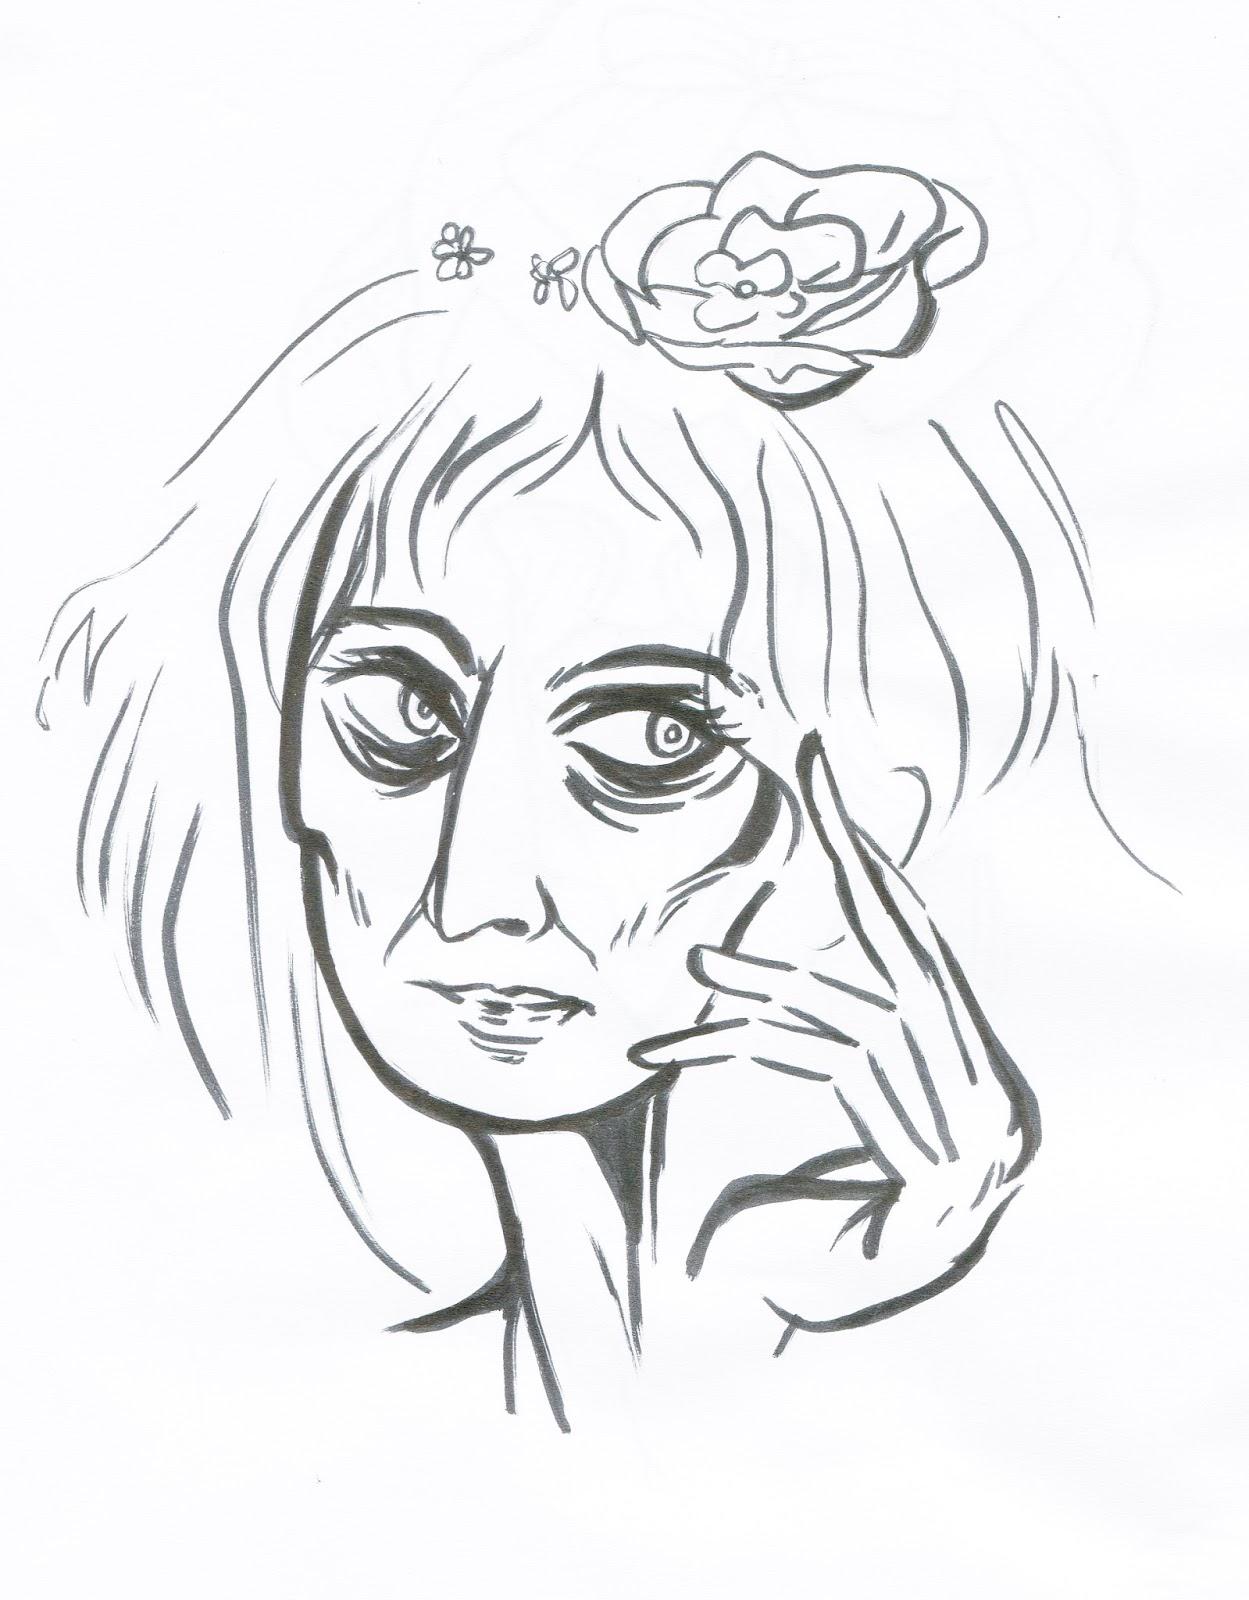 Eva Lynch Illustration: Mini-Project: Great Expectations